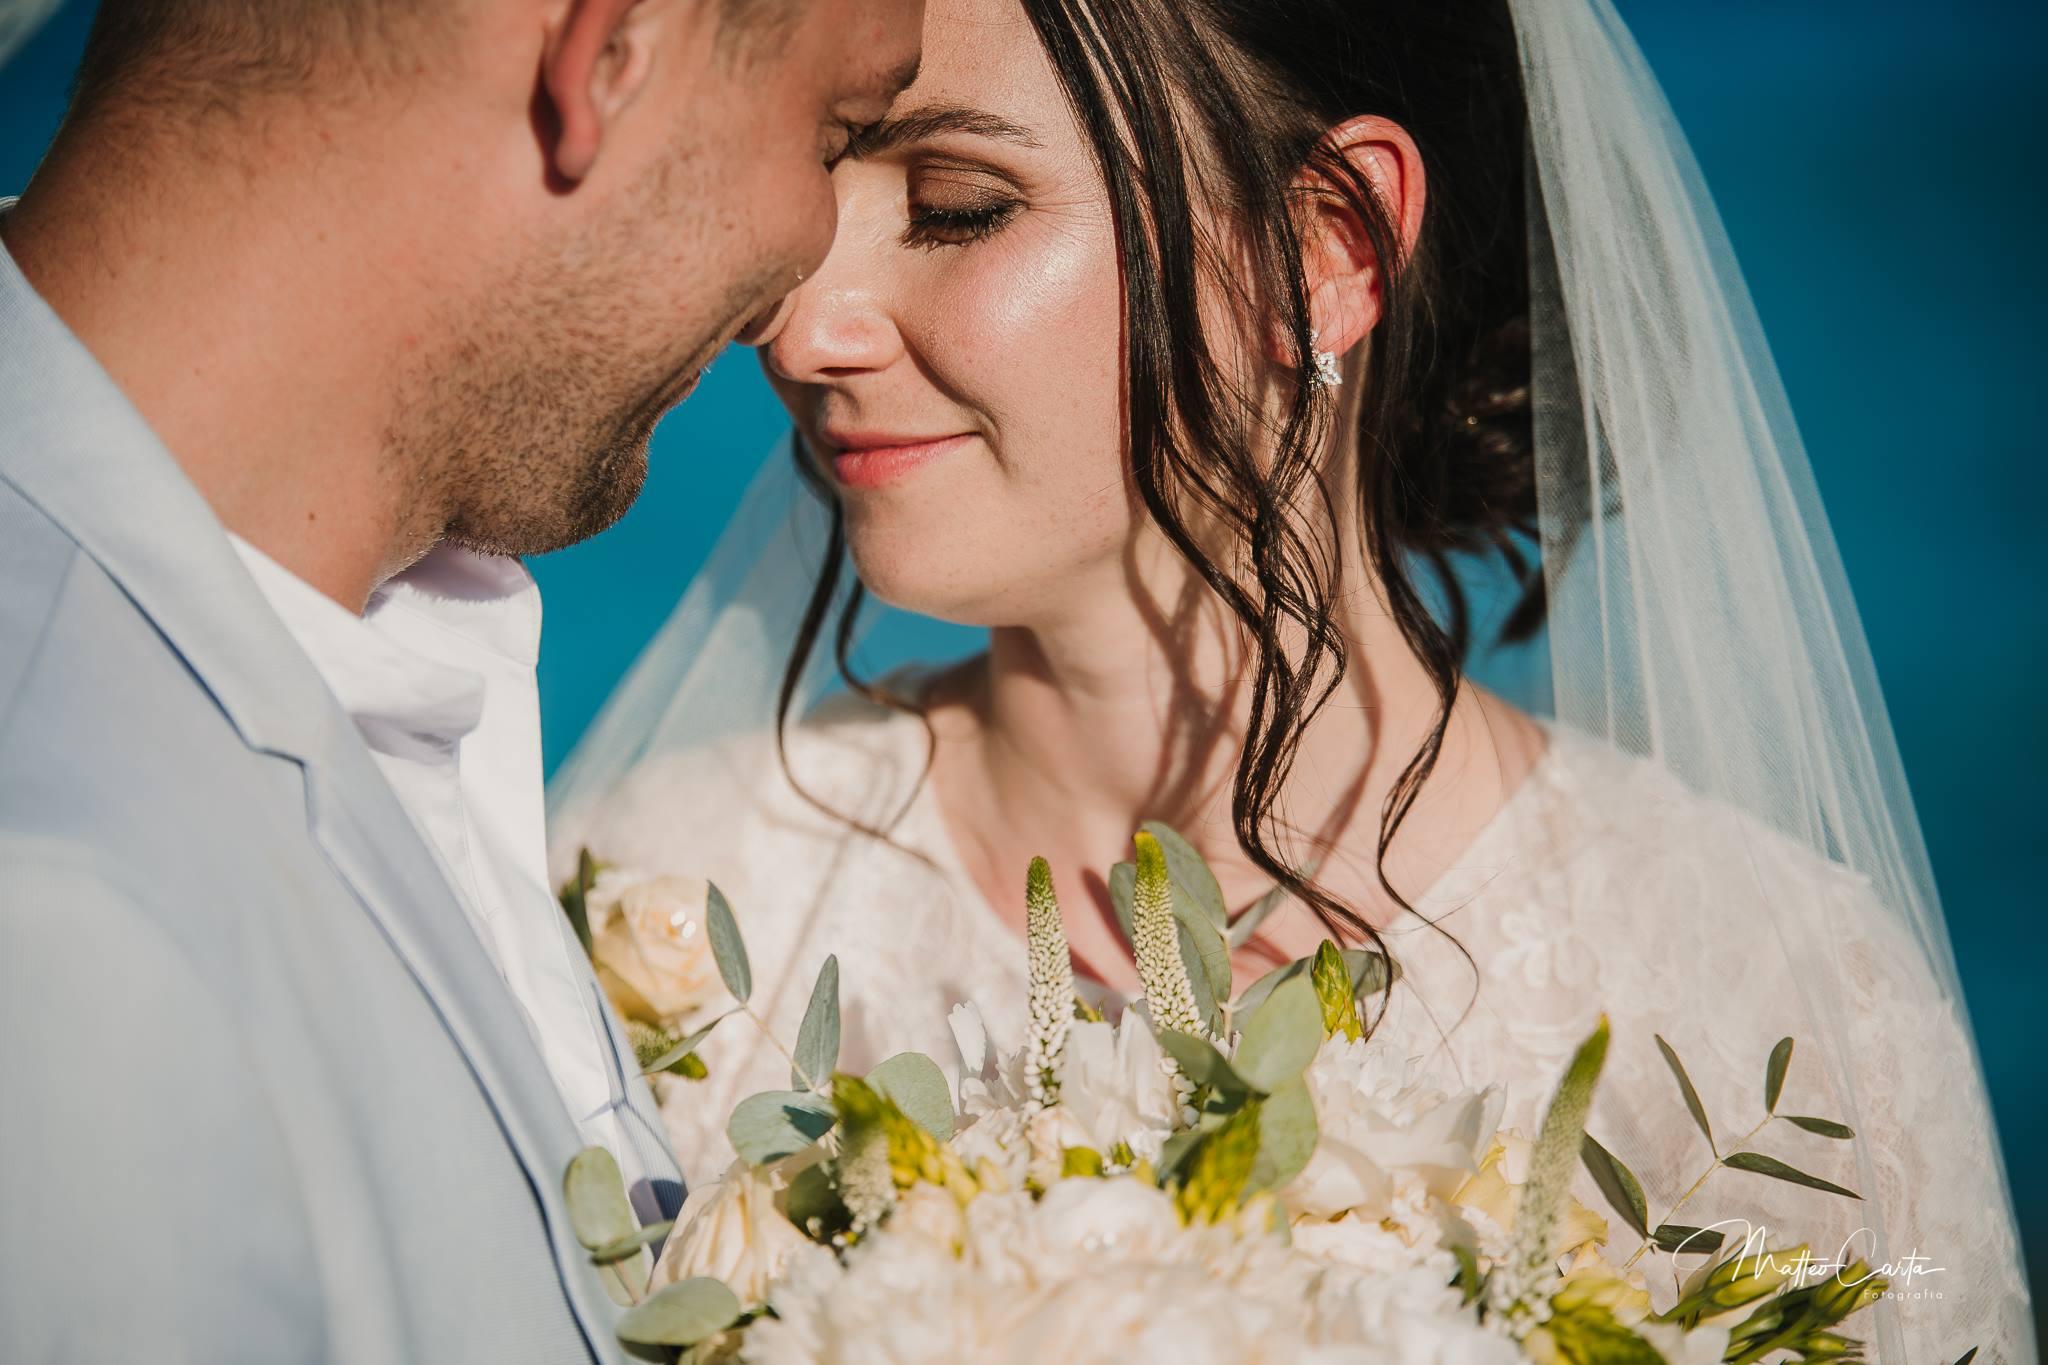 Olga & Nicolai - Destination Wedding in Sardinia